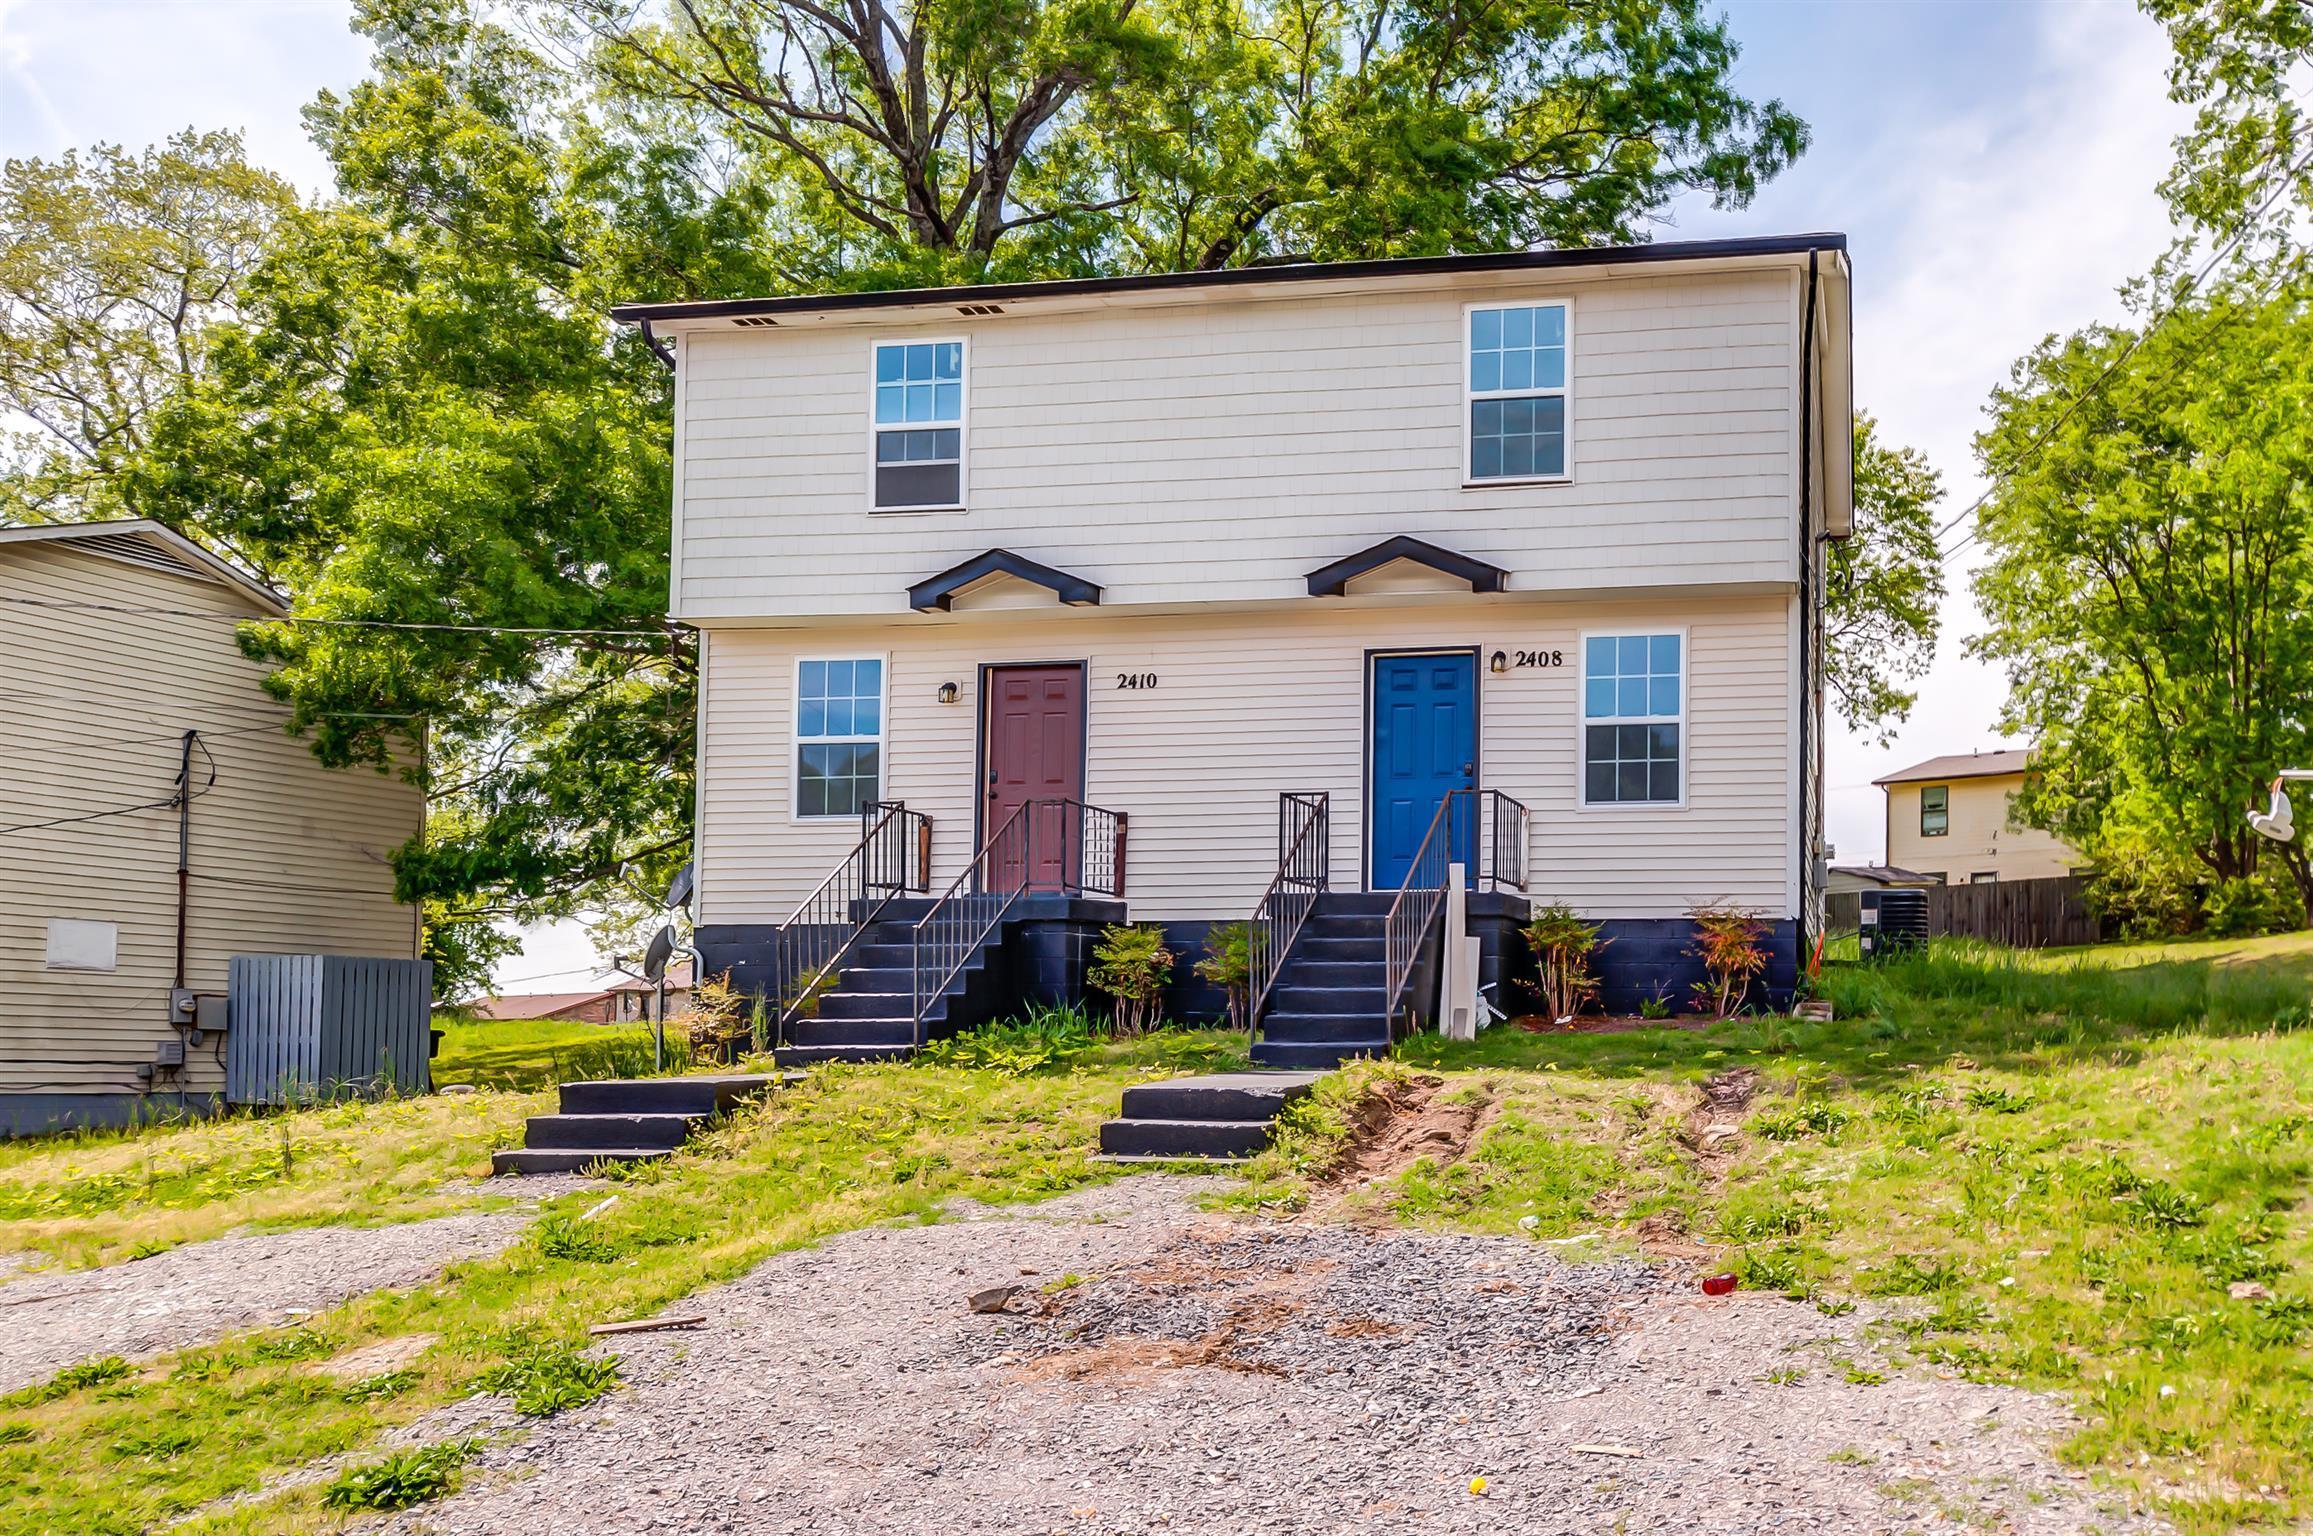 2408 Woodale Ln, Nashville, TN 37207 - Nashville, TN real estate listing